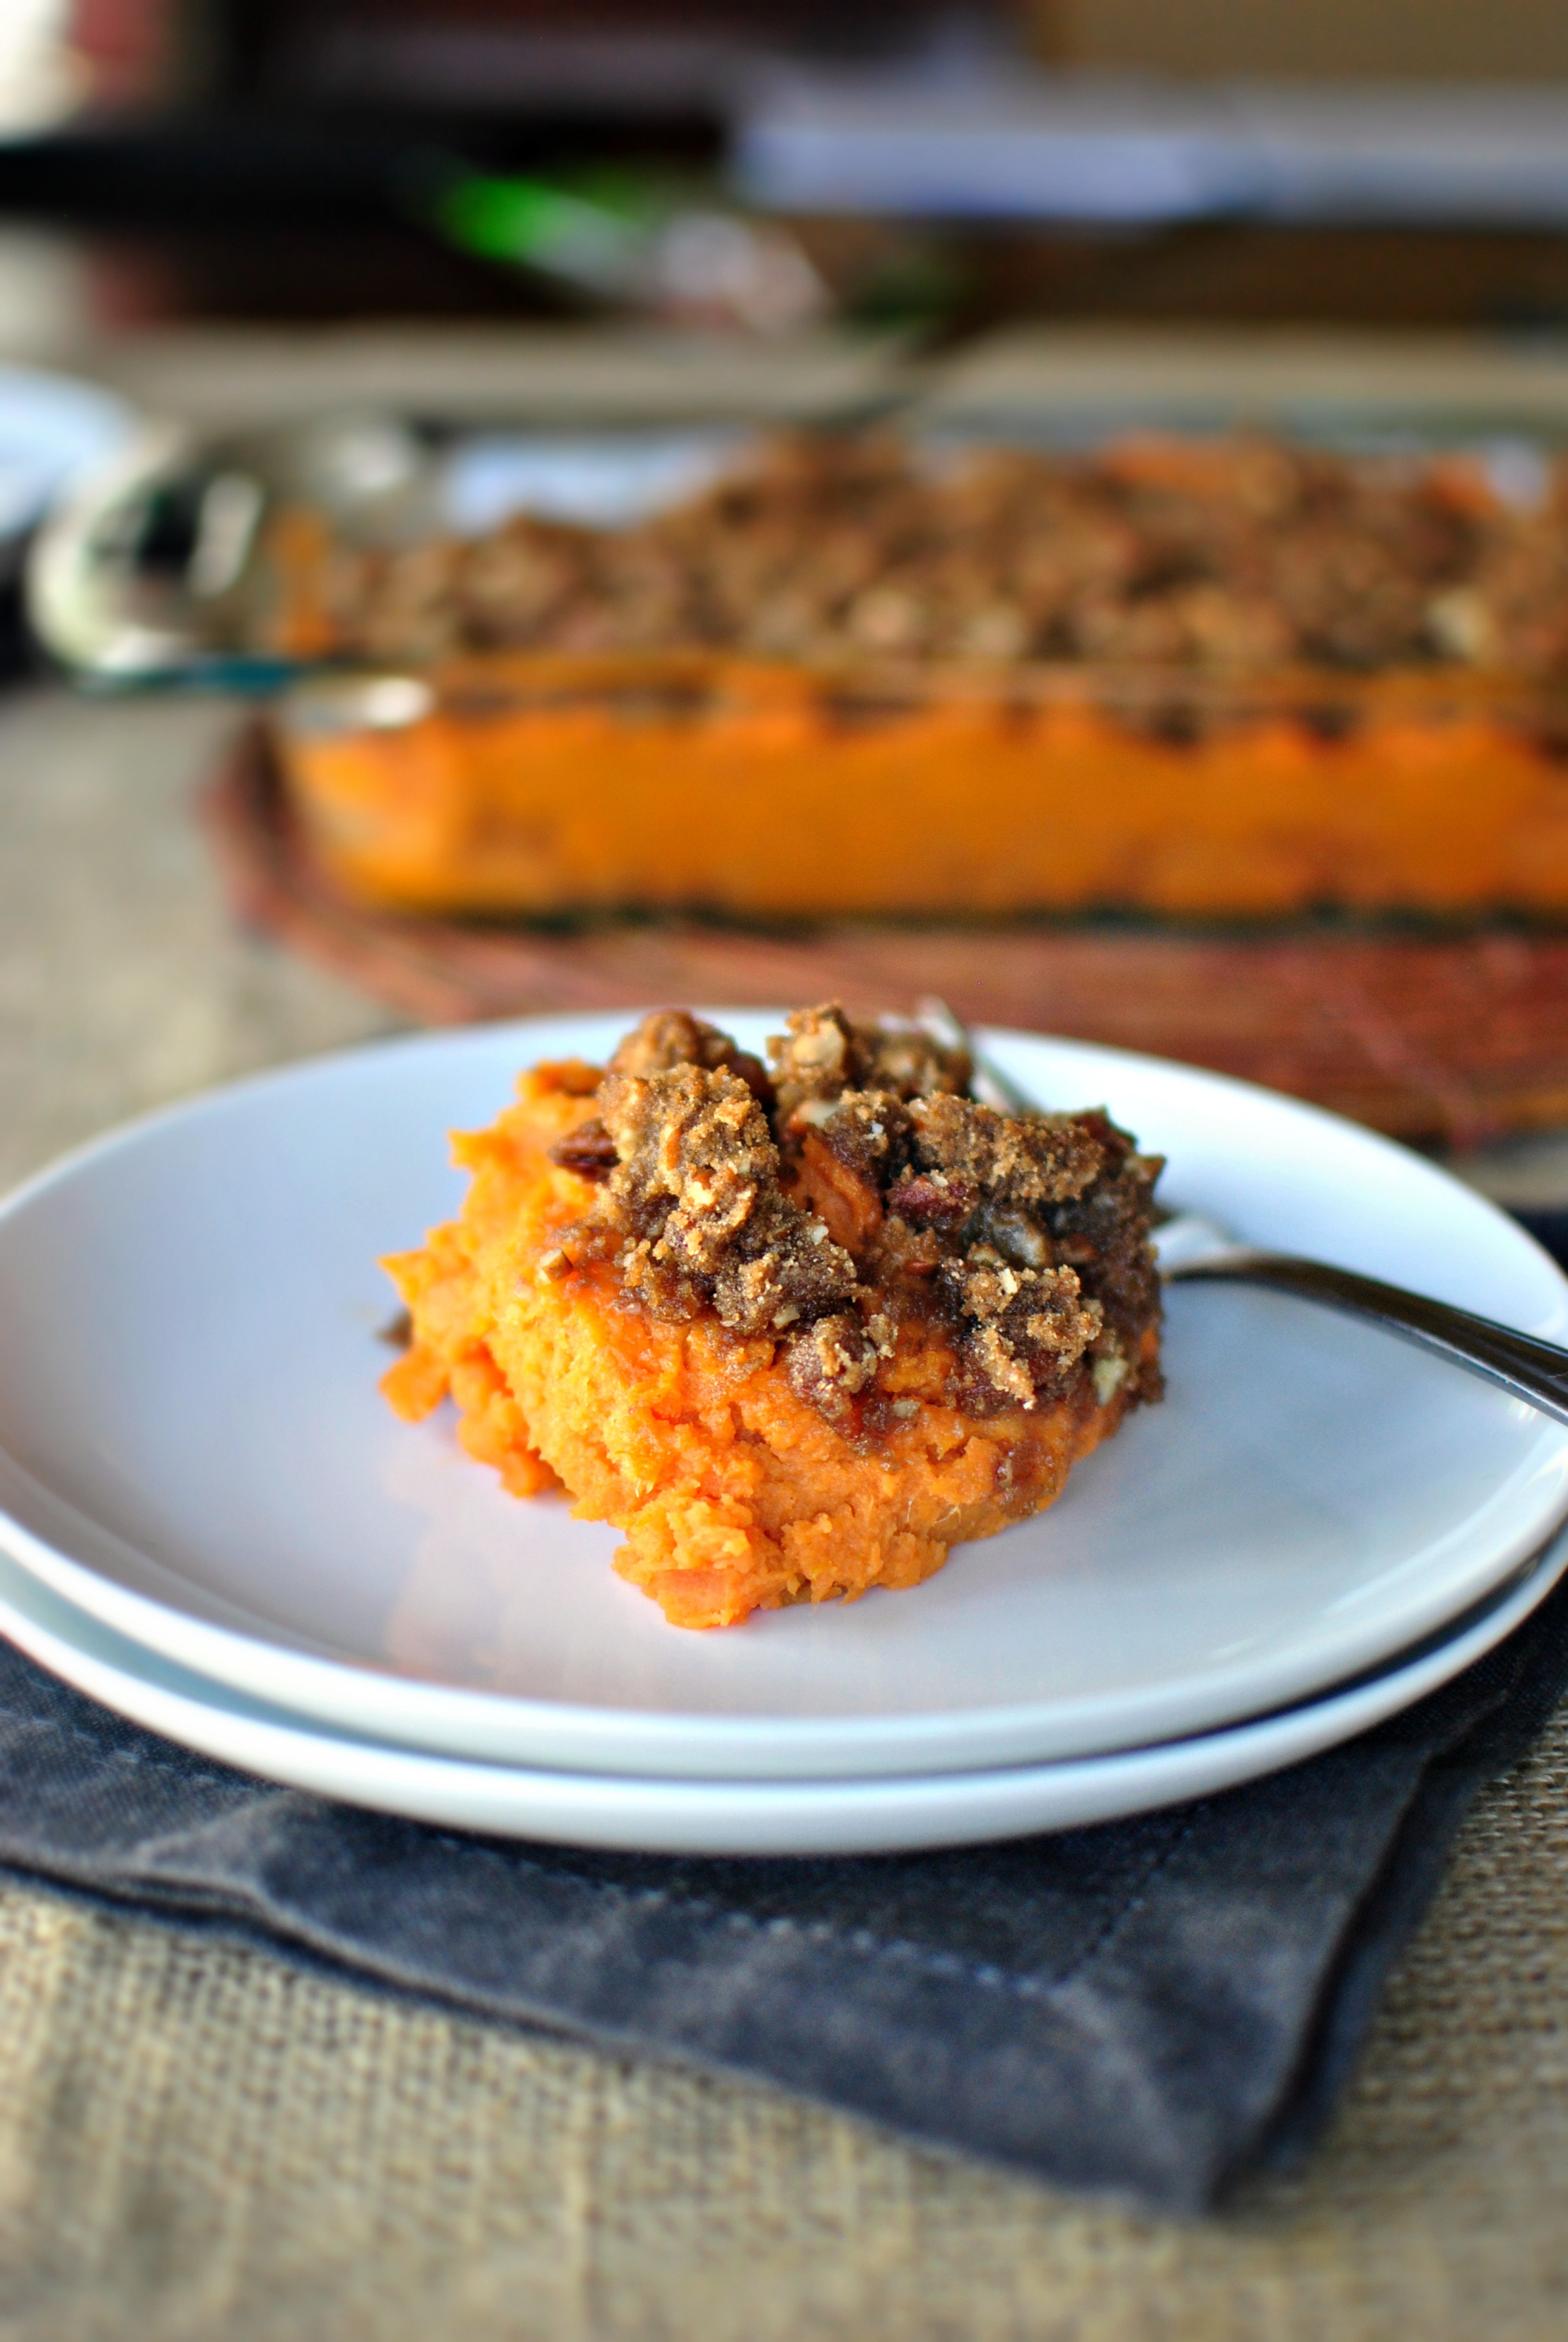 Simply Scratch » Bourbon Bacon Sweet Potato Casserole